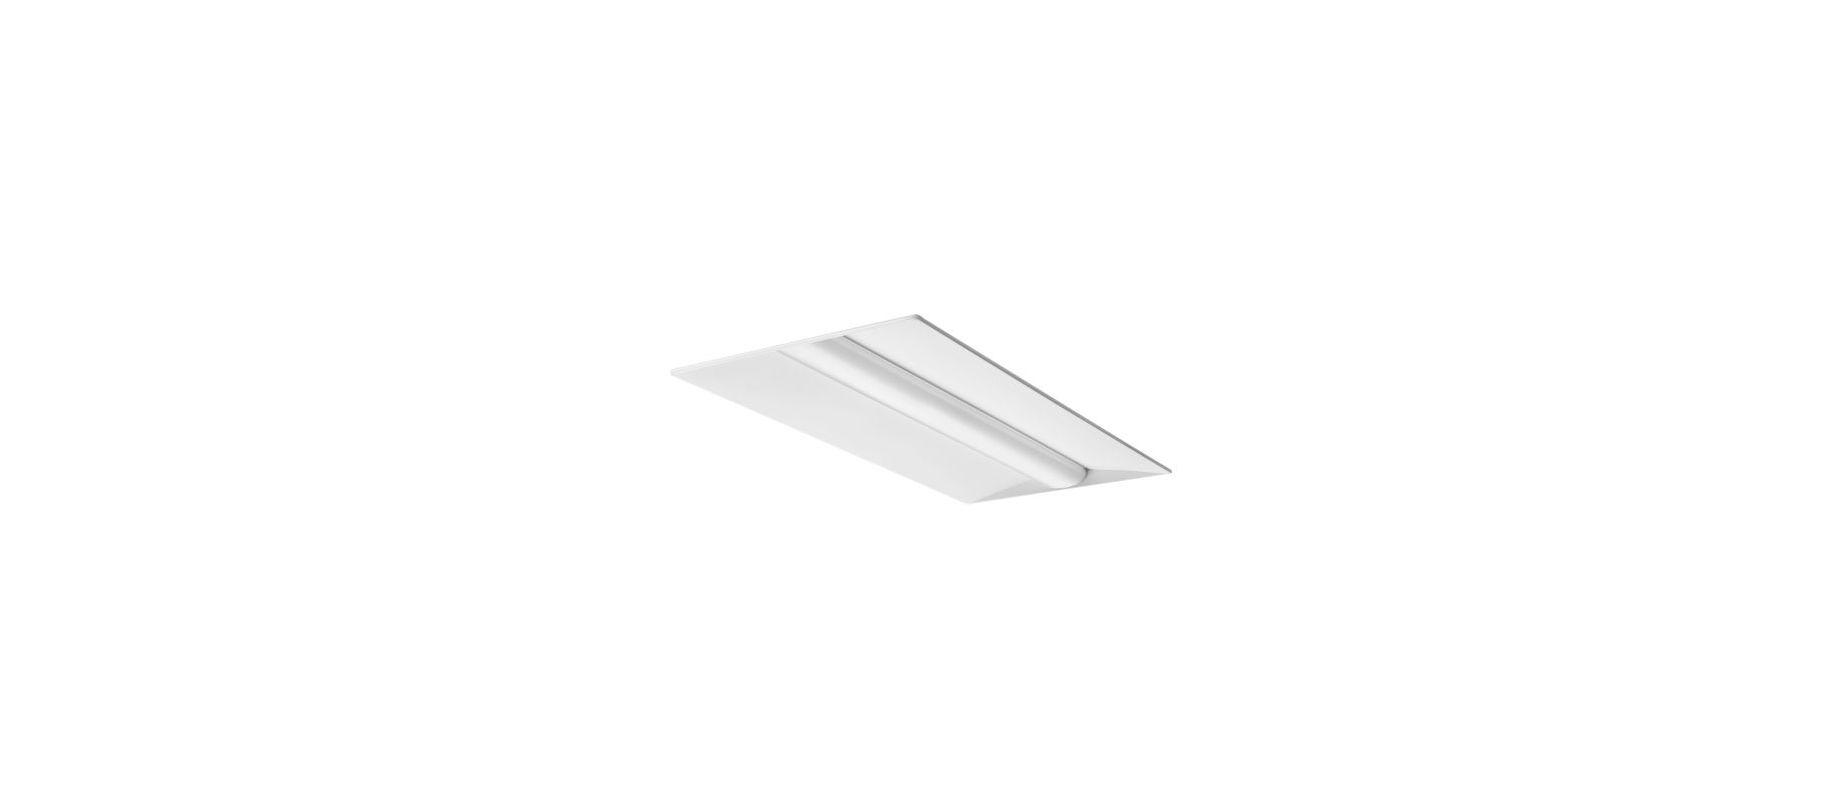 "Lithonia Lighting 2BLT4 46L ADP LP835 BLT Single Light 47"" Wide"